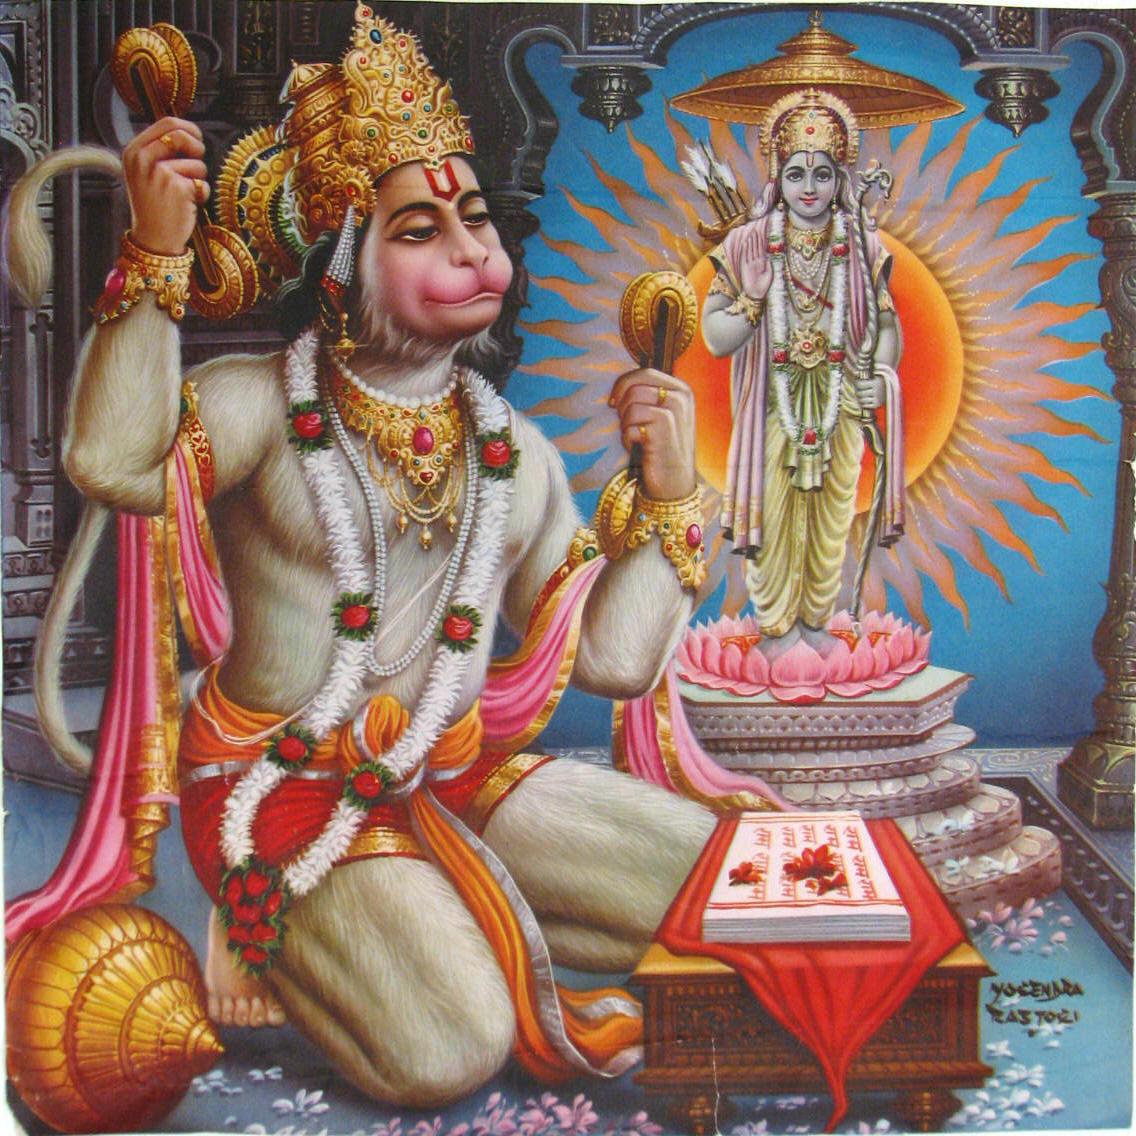 http://1.bp.blogspot.com/_OCu_uIvUaLs/THyxyAmq33I/AAAAAAAACYA/YyAVtr-Mihk/s1600/hanuman-praying-to-shri-ram.jpg